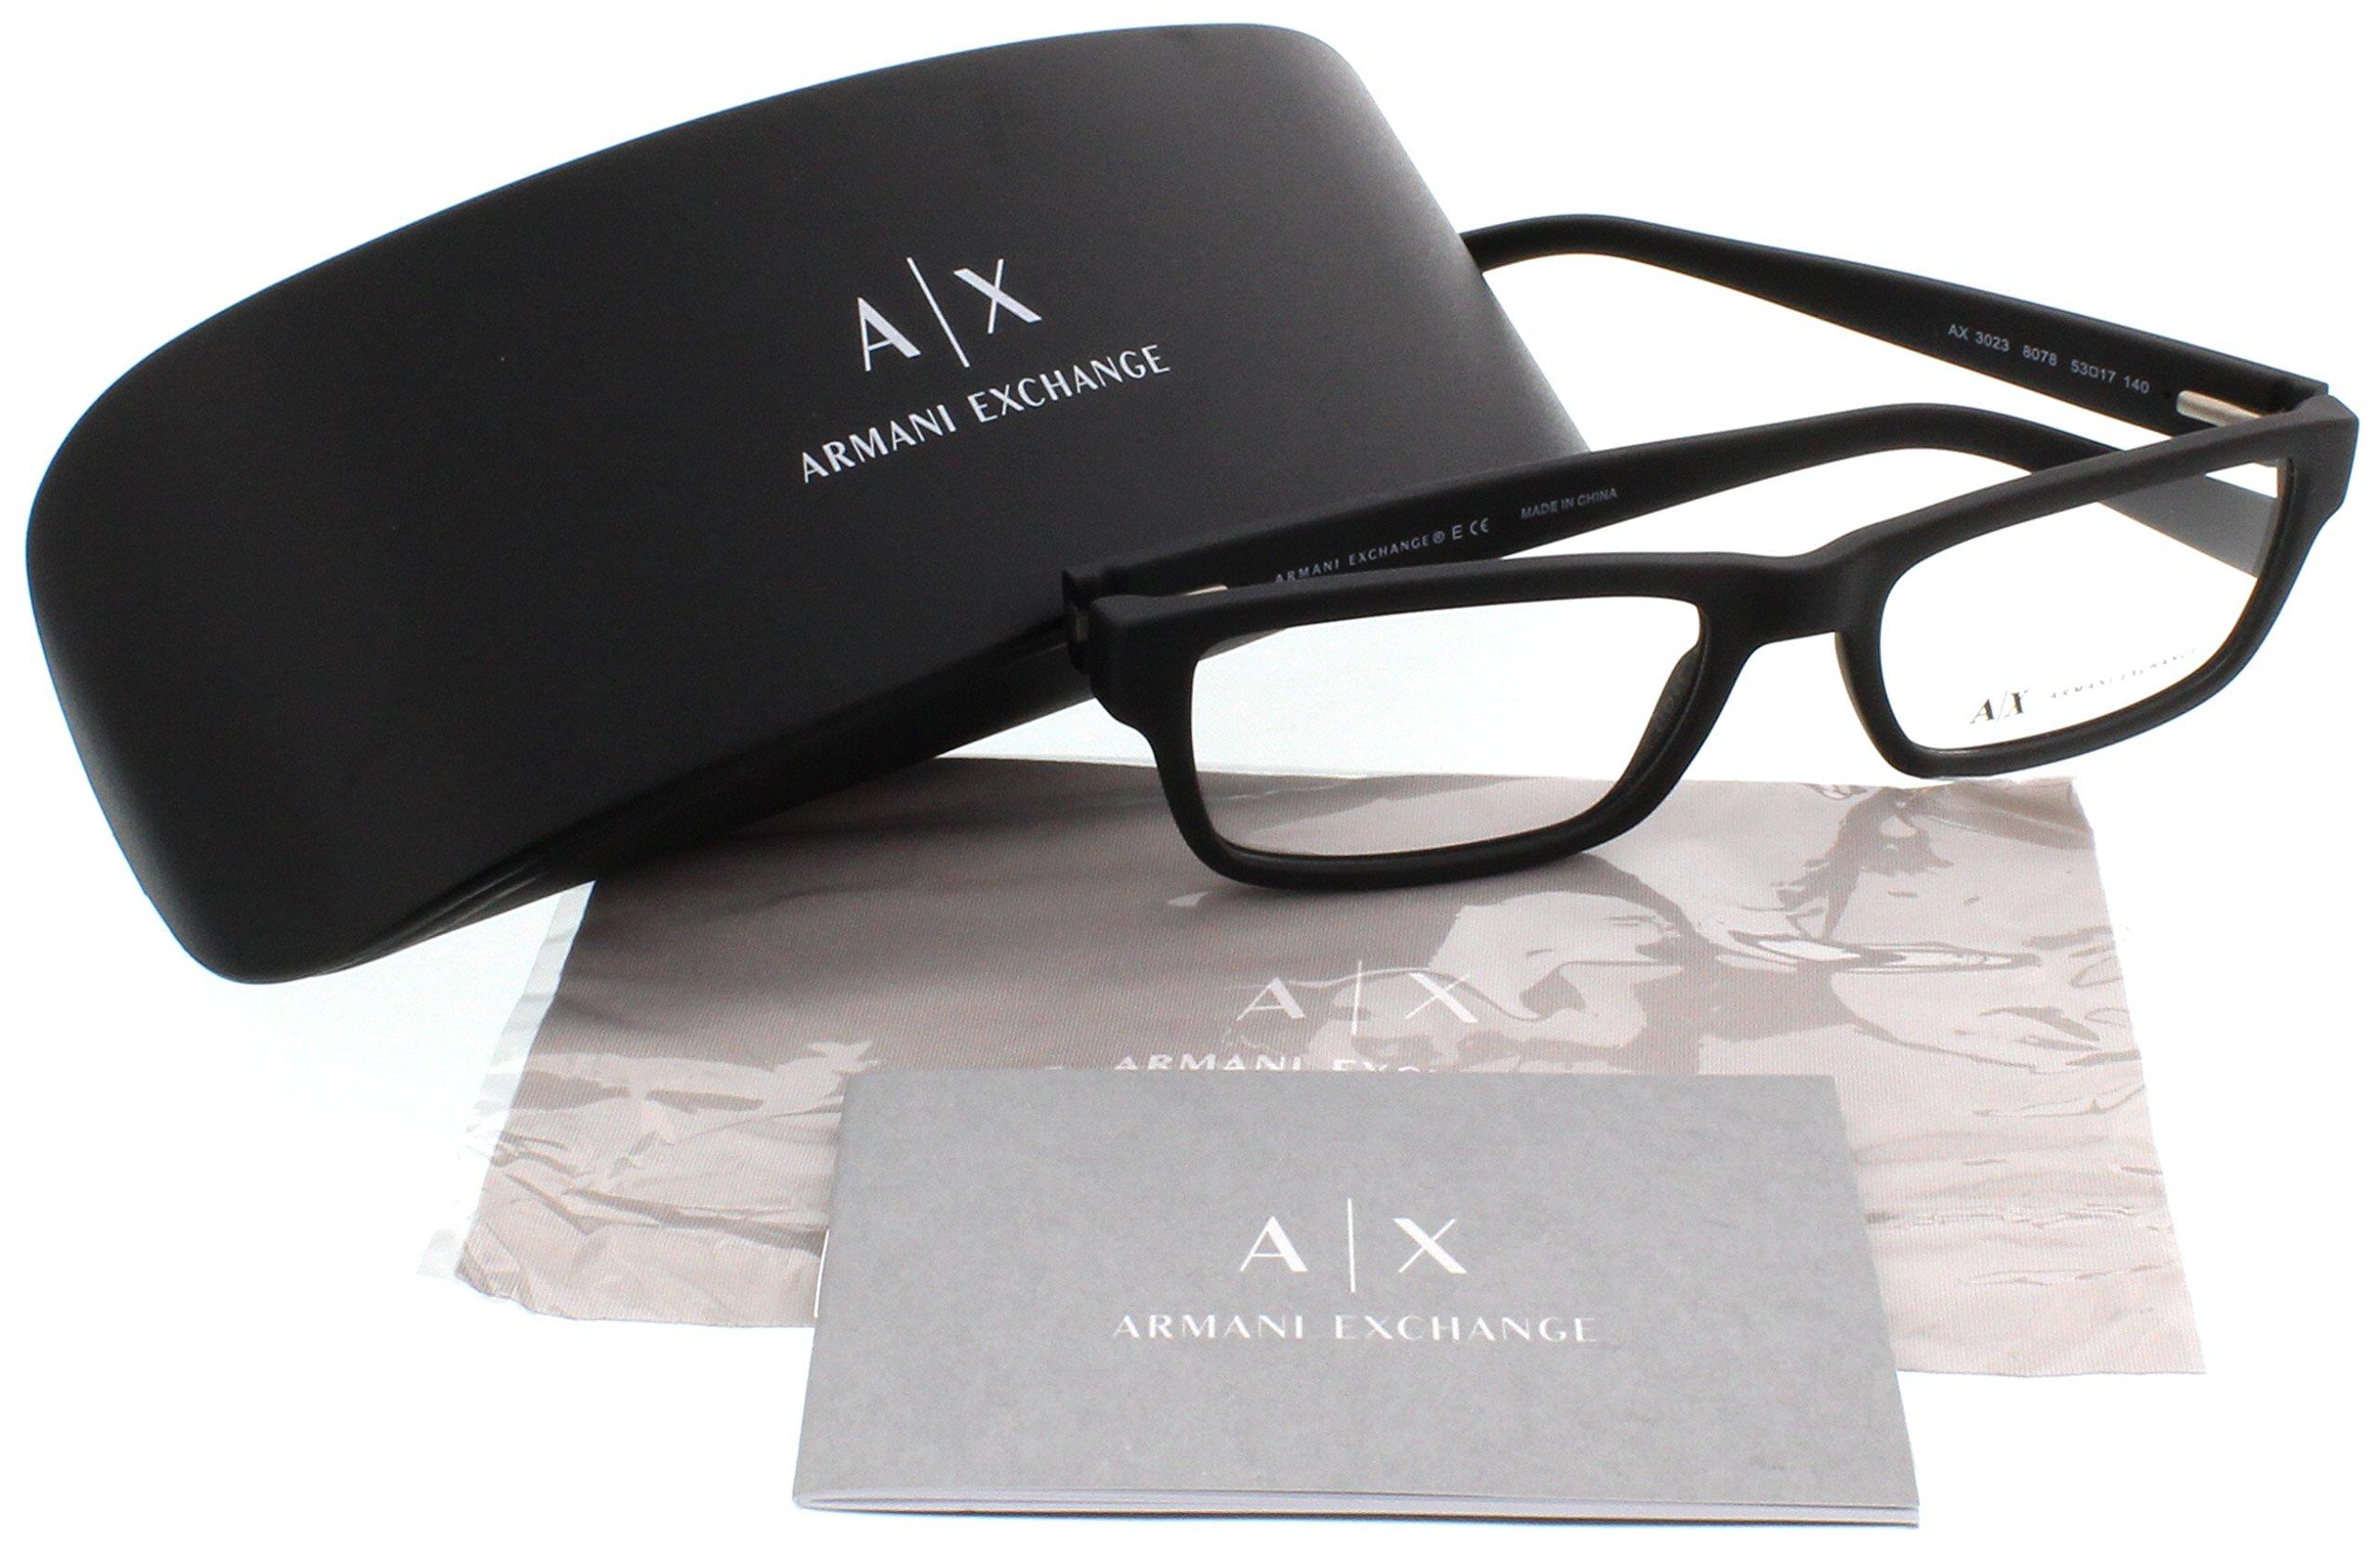 Armani Exchange AX3023 Eyeglass Frames 8078-53 - Matte Black AX3023-8078-53